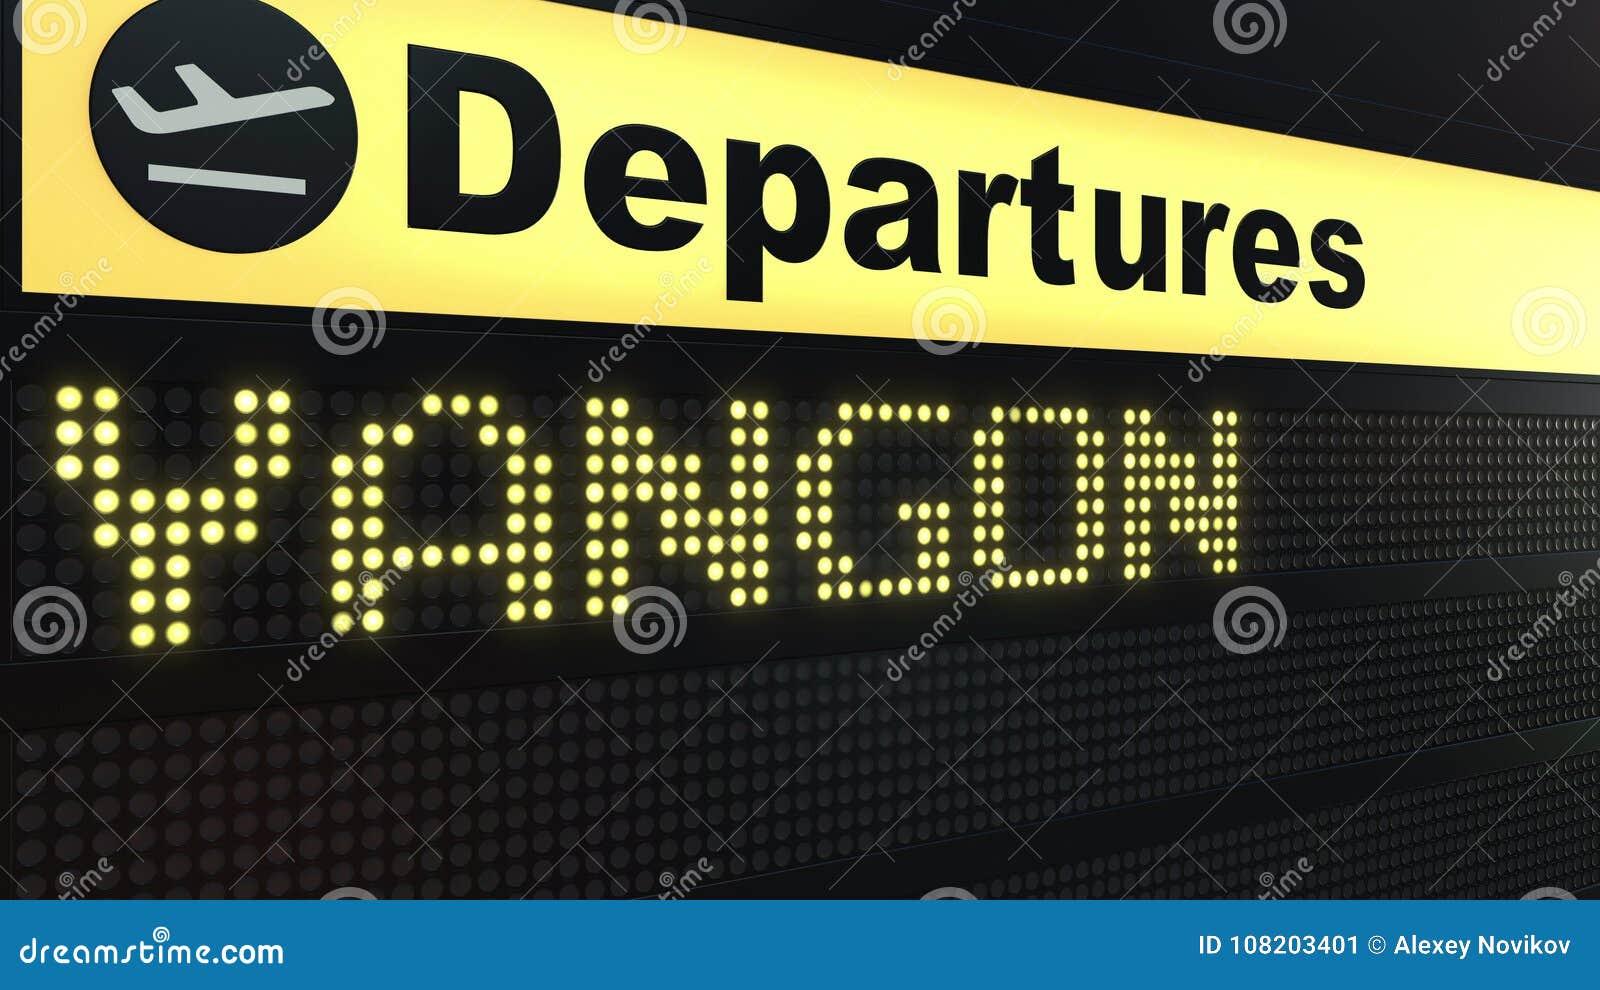 Yangon Airport Stock Illustrations 6 Yangon Airport Stock Illustrations Vectors Clipart Dreamstime